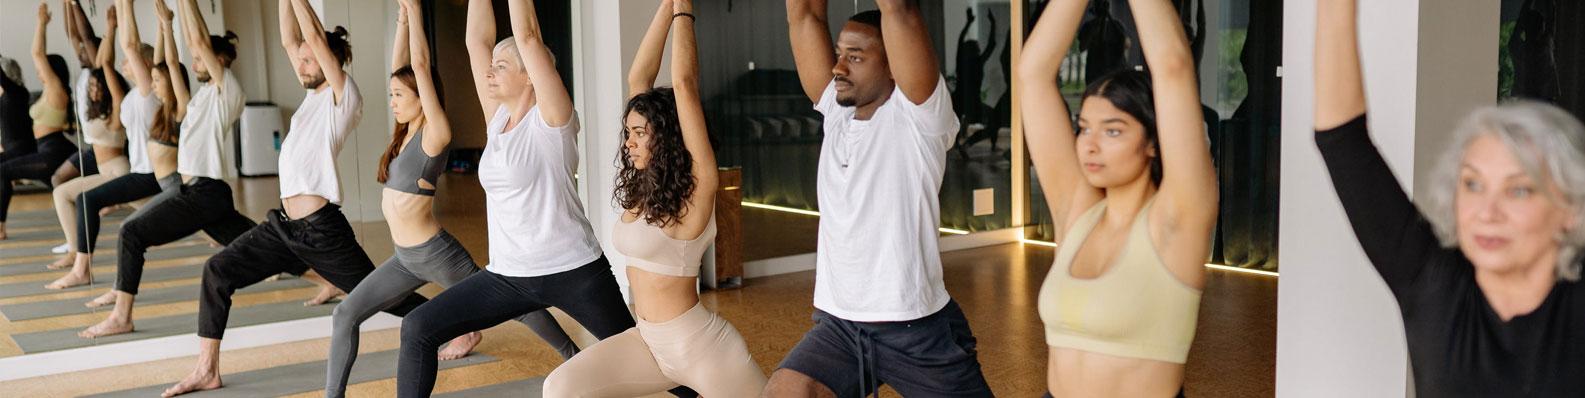 Organize a Yoga Workshop around the Holidays